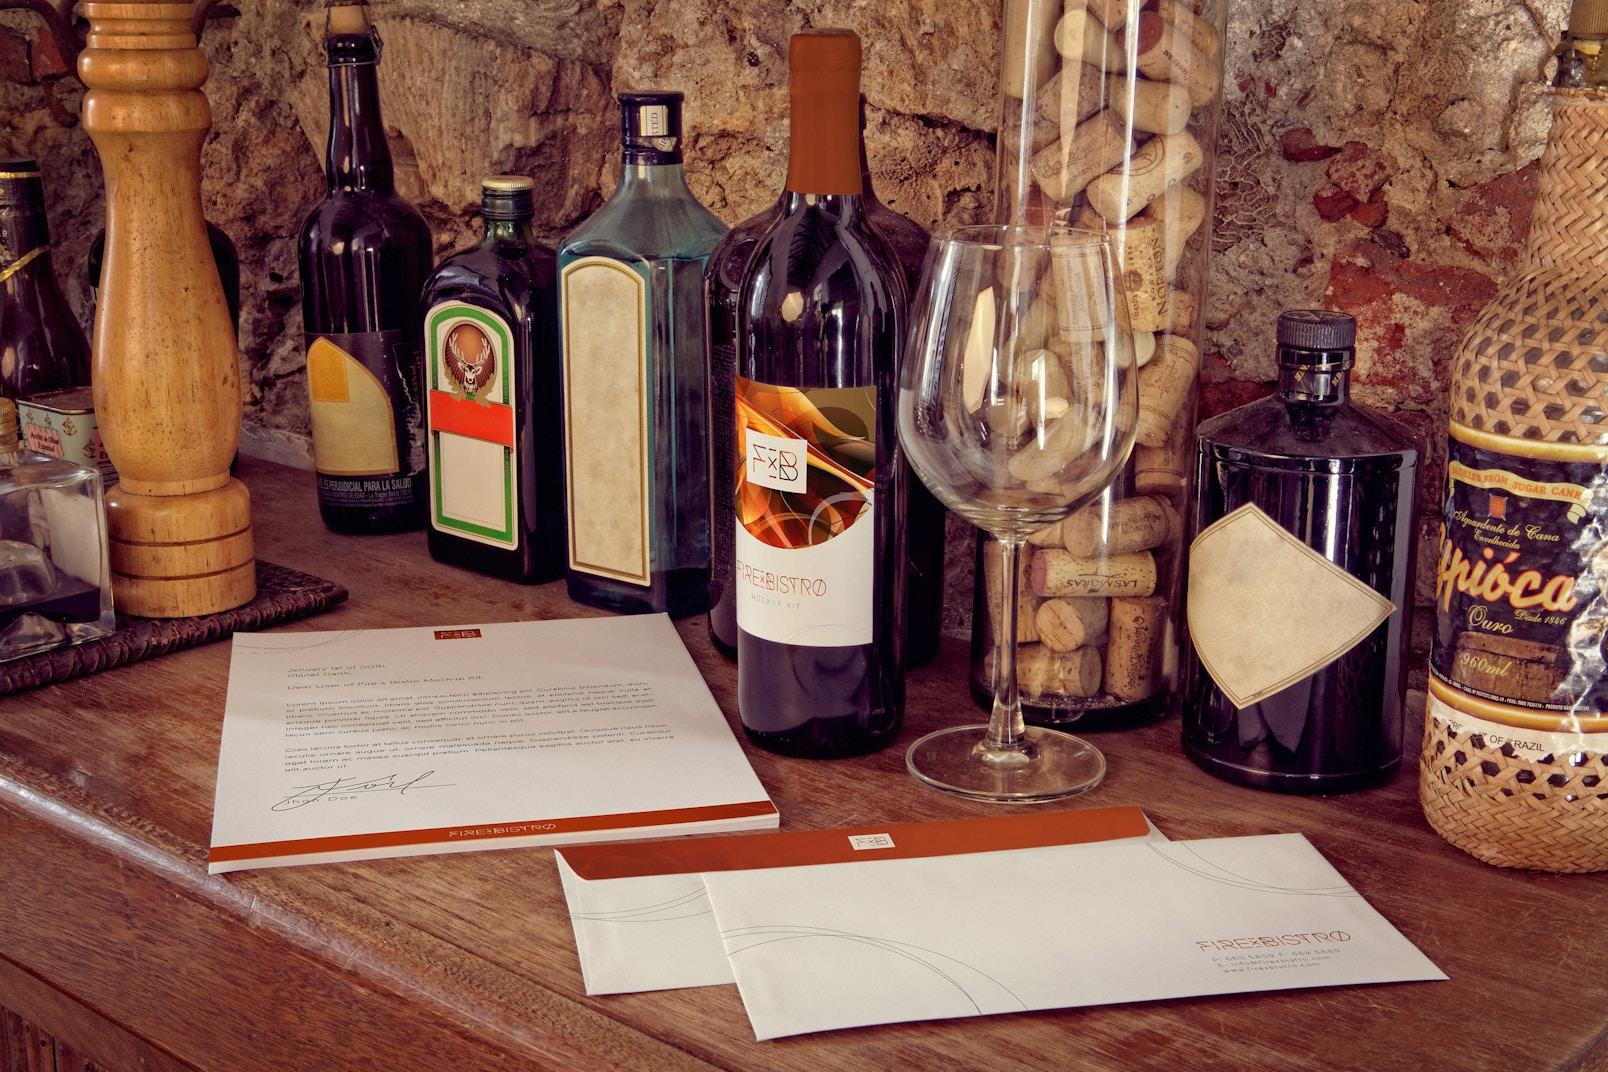 Letterhead, Wine Bottle, Envelope Mockup